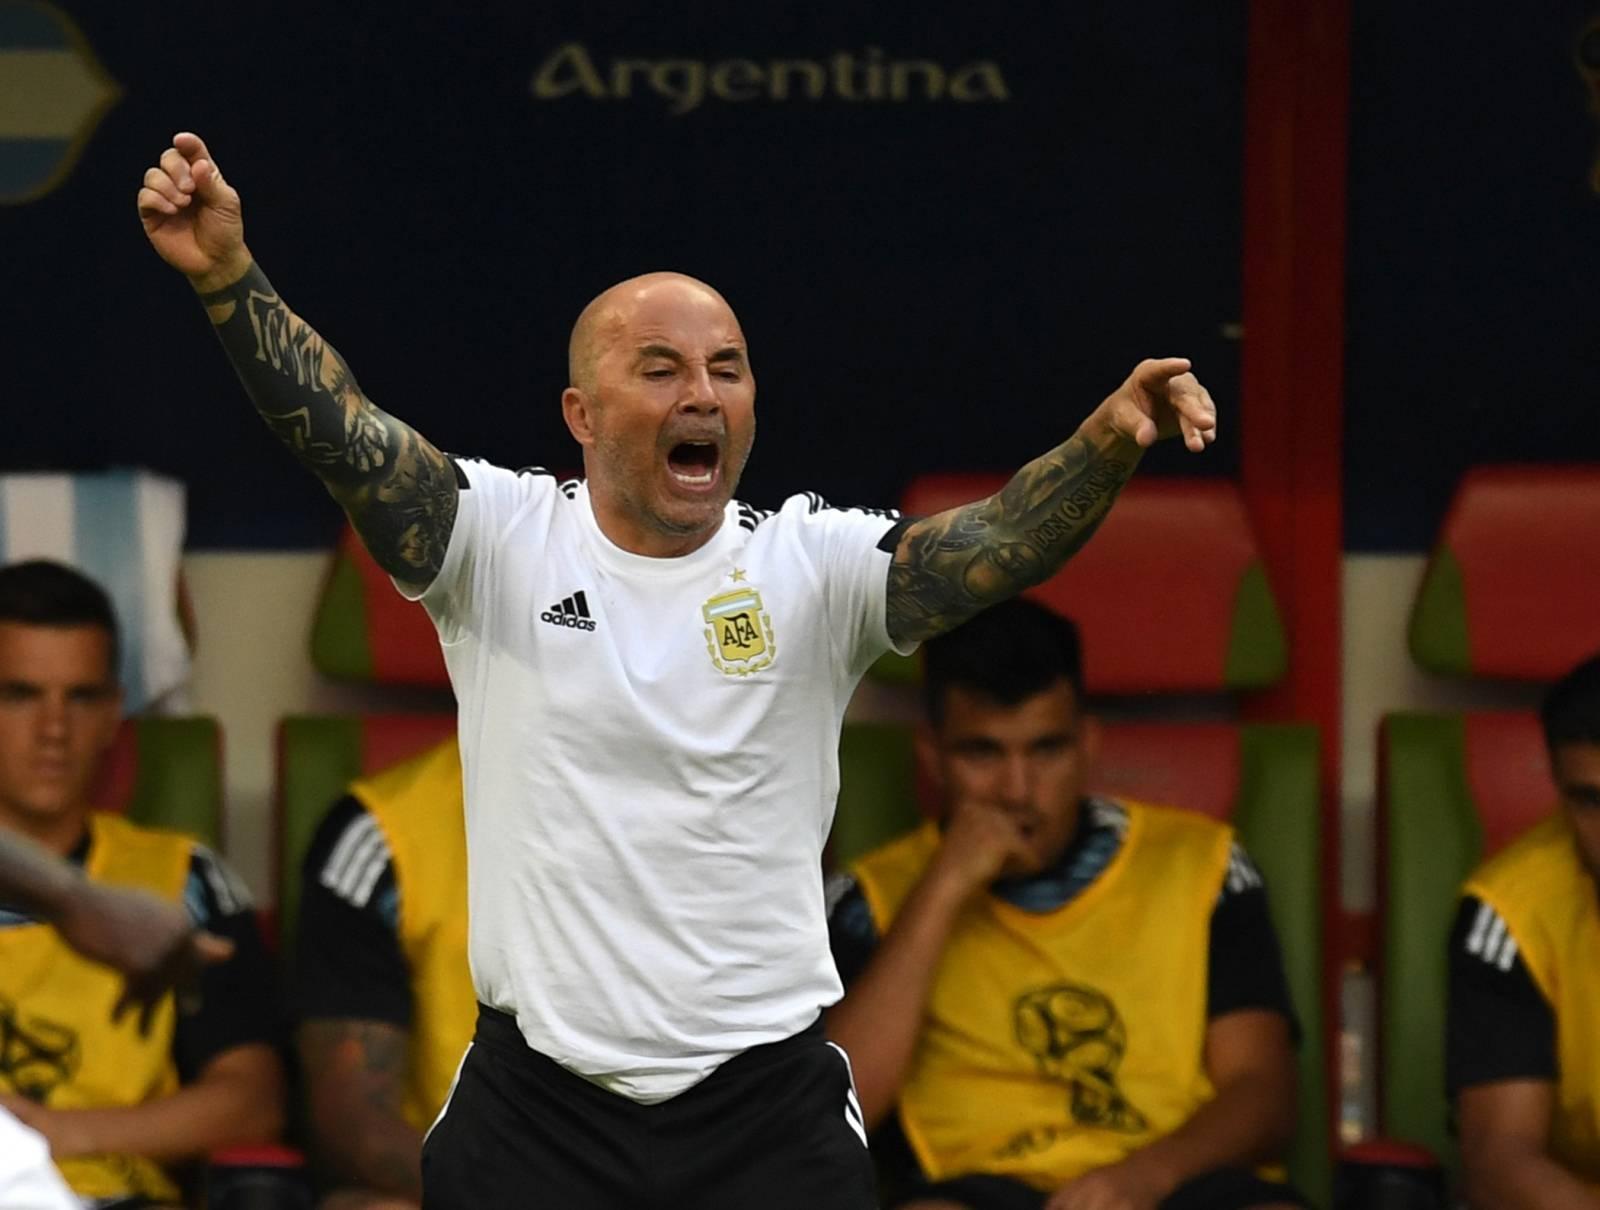 World Cup 2018 - France vs. Argentina